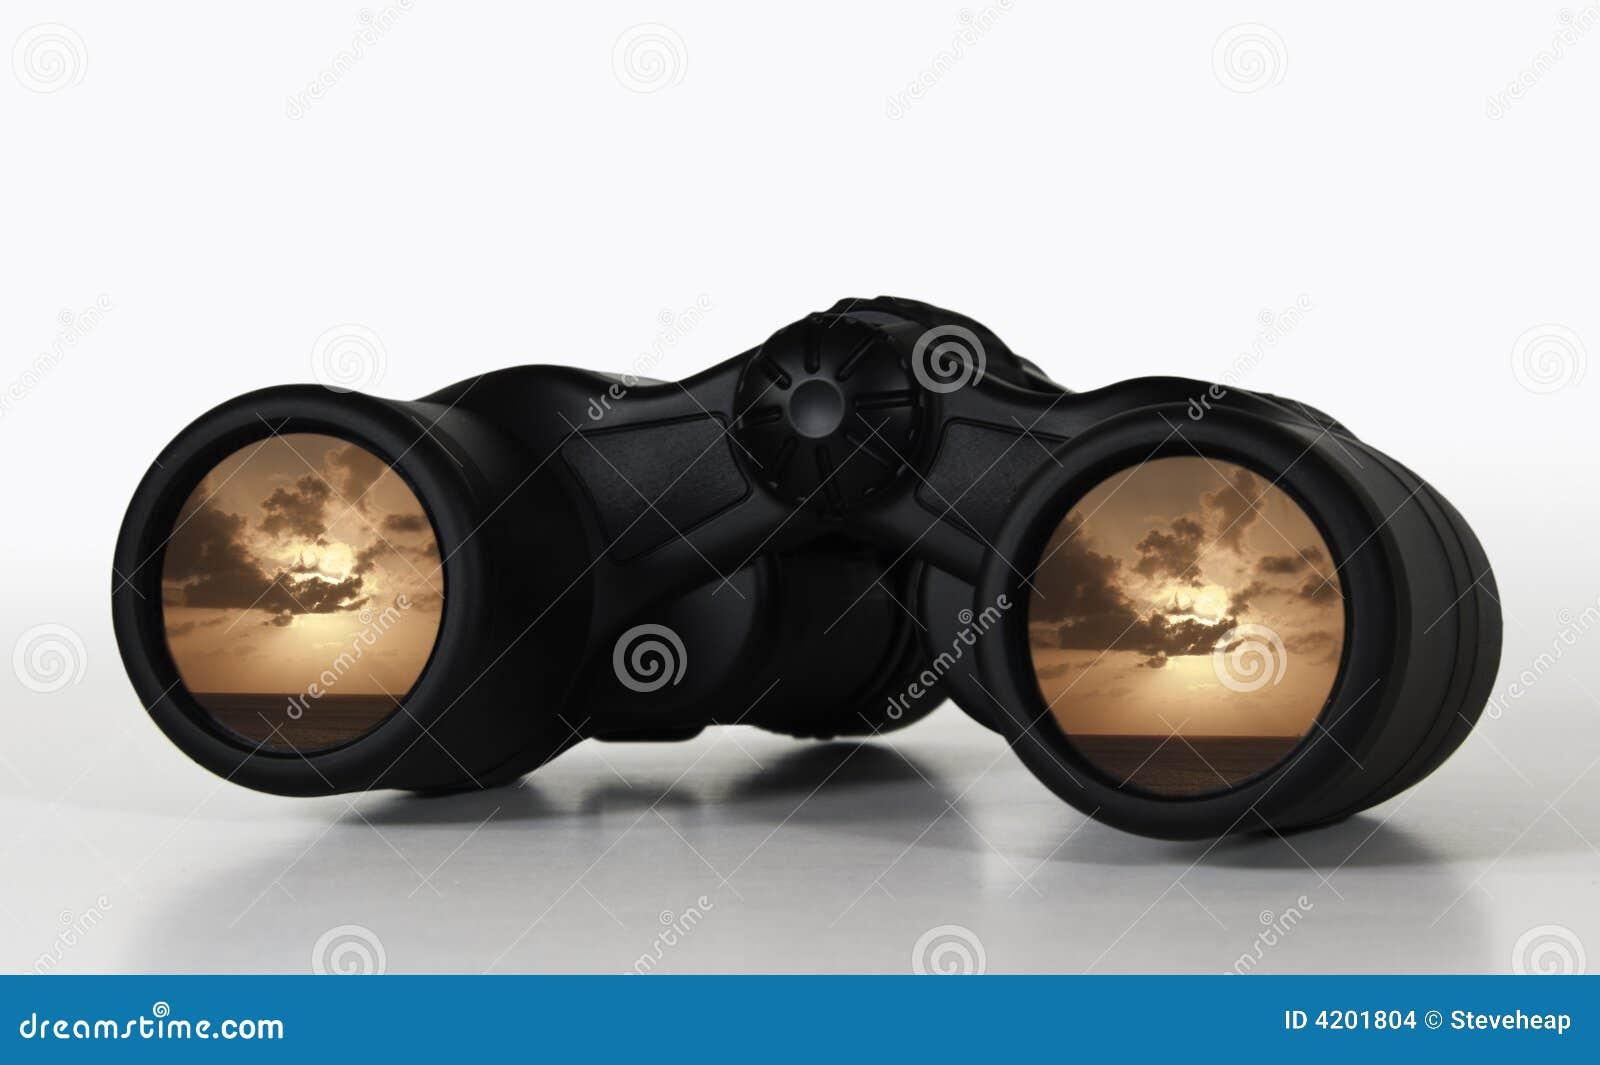 Binoculars showing distant sunset